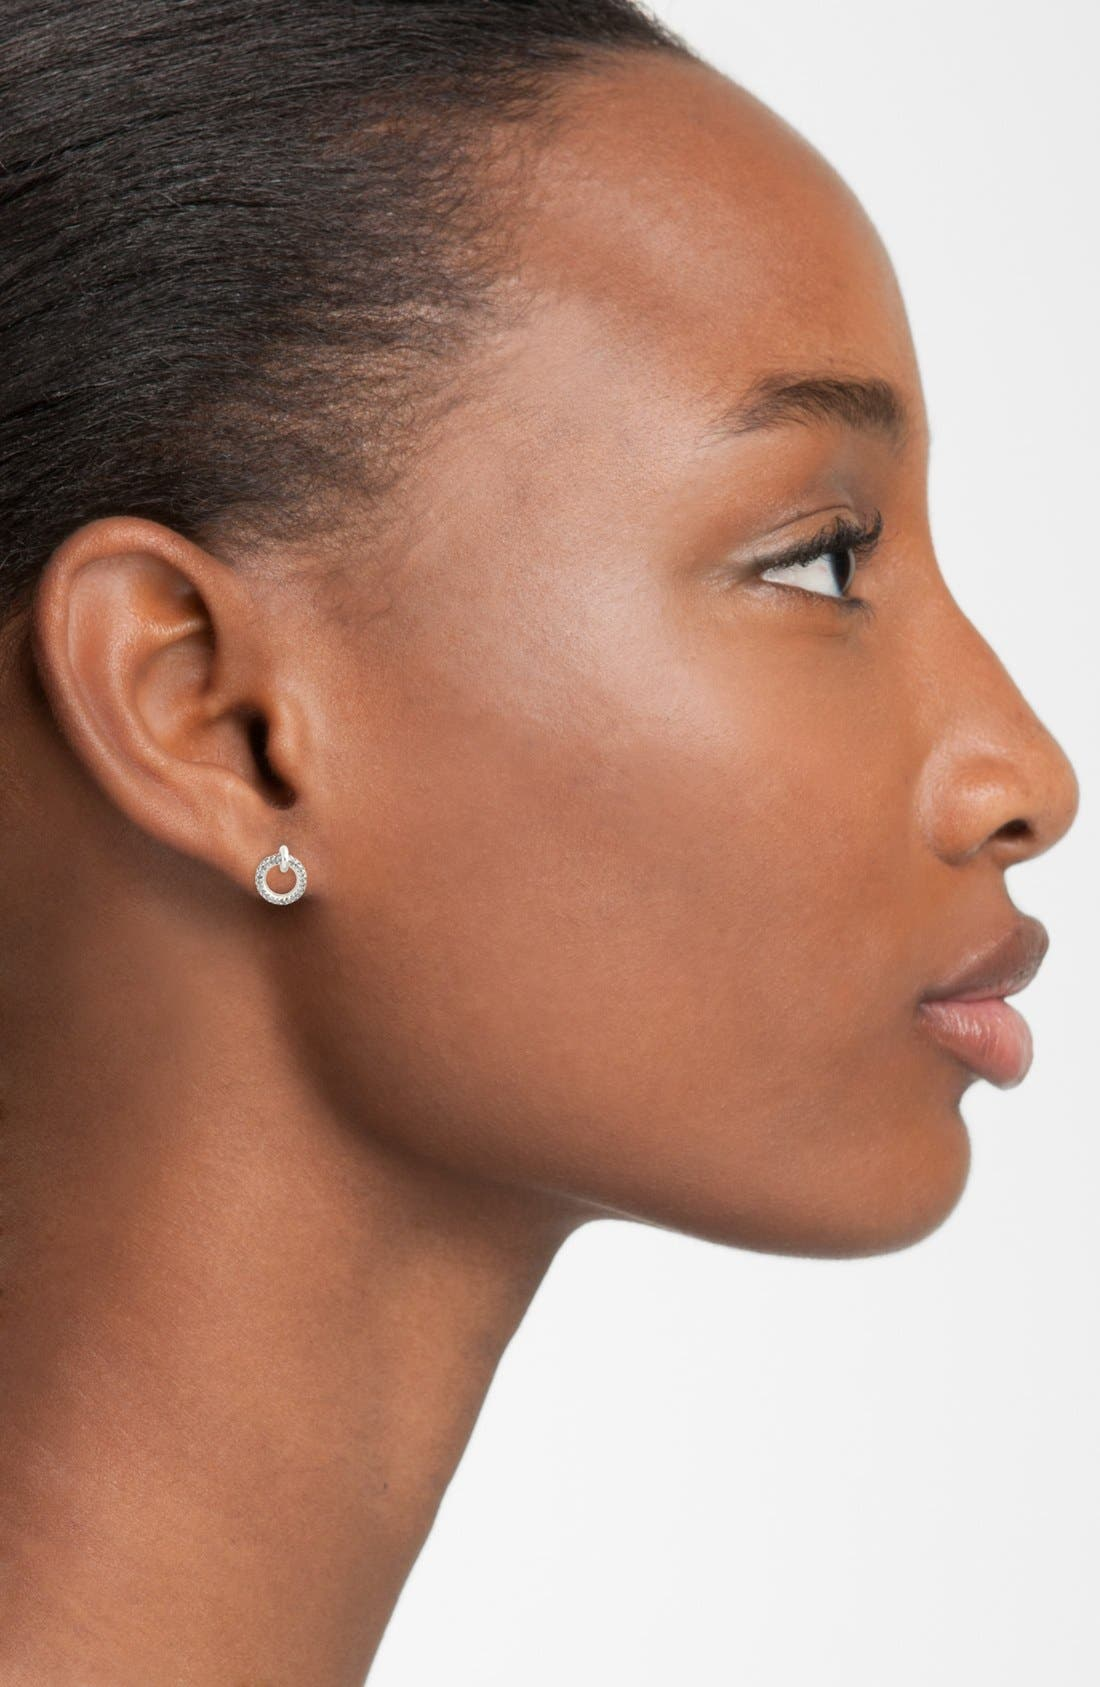 Pavé Halo Grey Diamond Stud Earrings,                             Alternate thumbnail 2, color,                             Grey Diamond